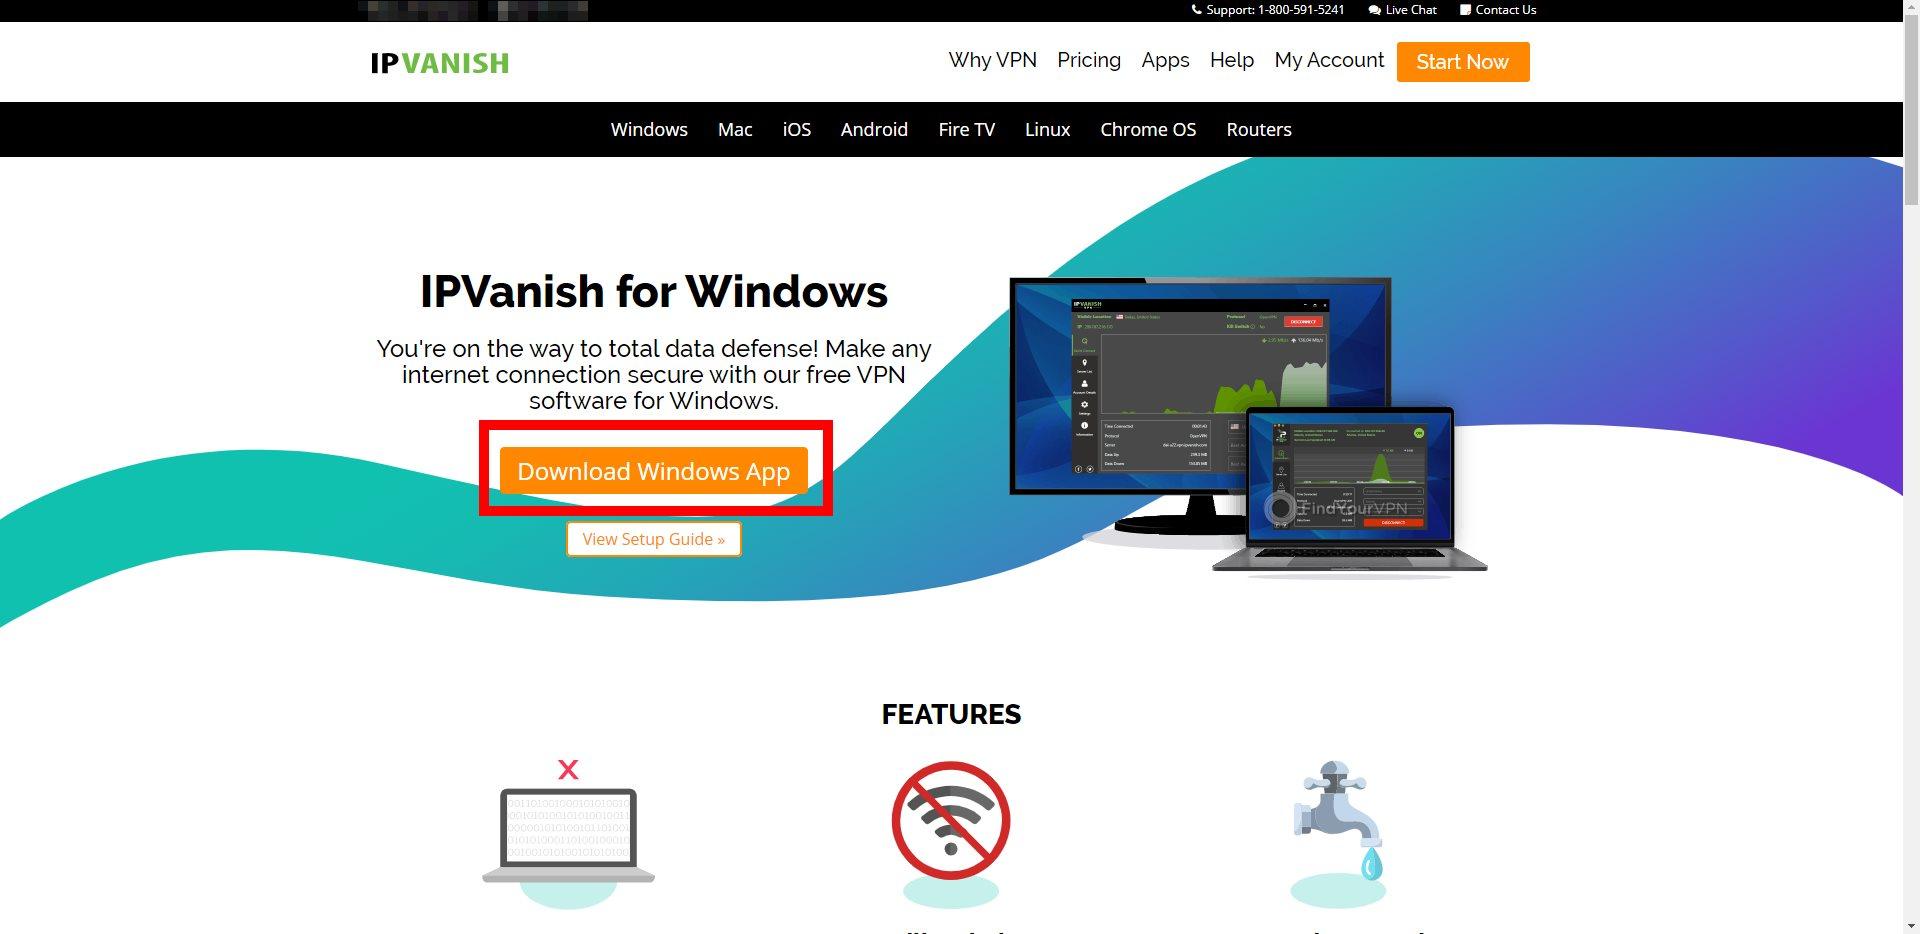 IPVanish Download Windows App Button